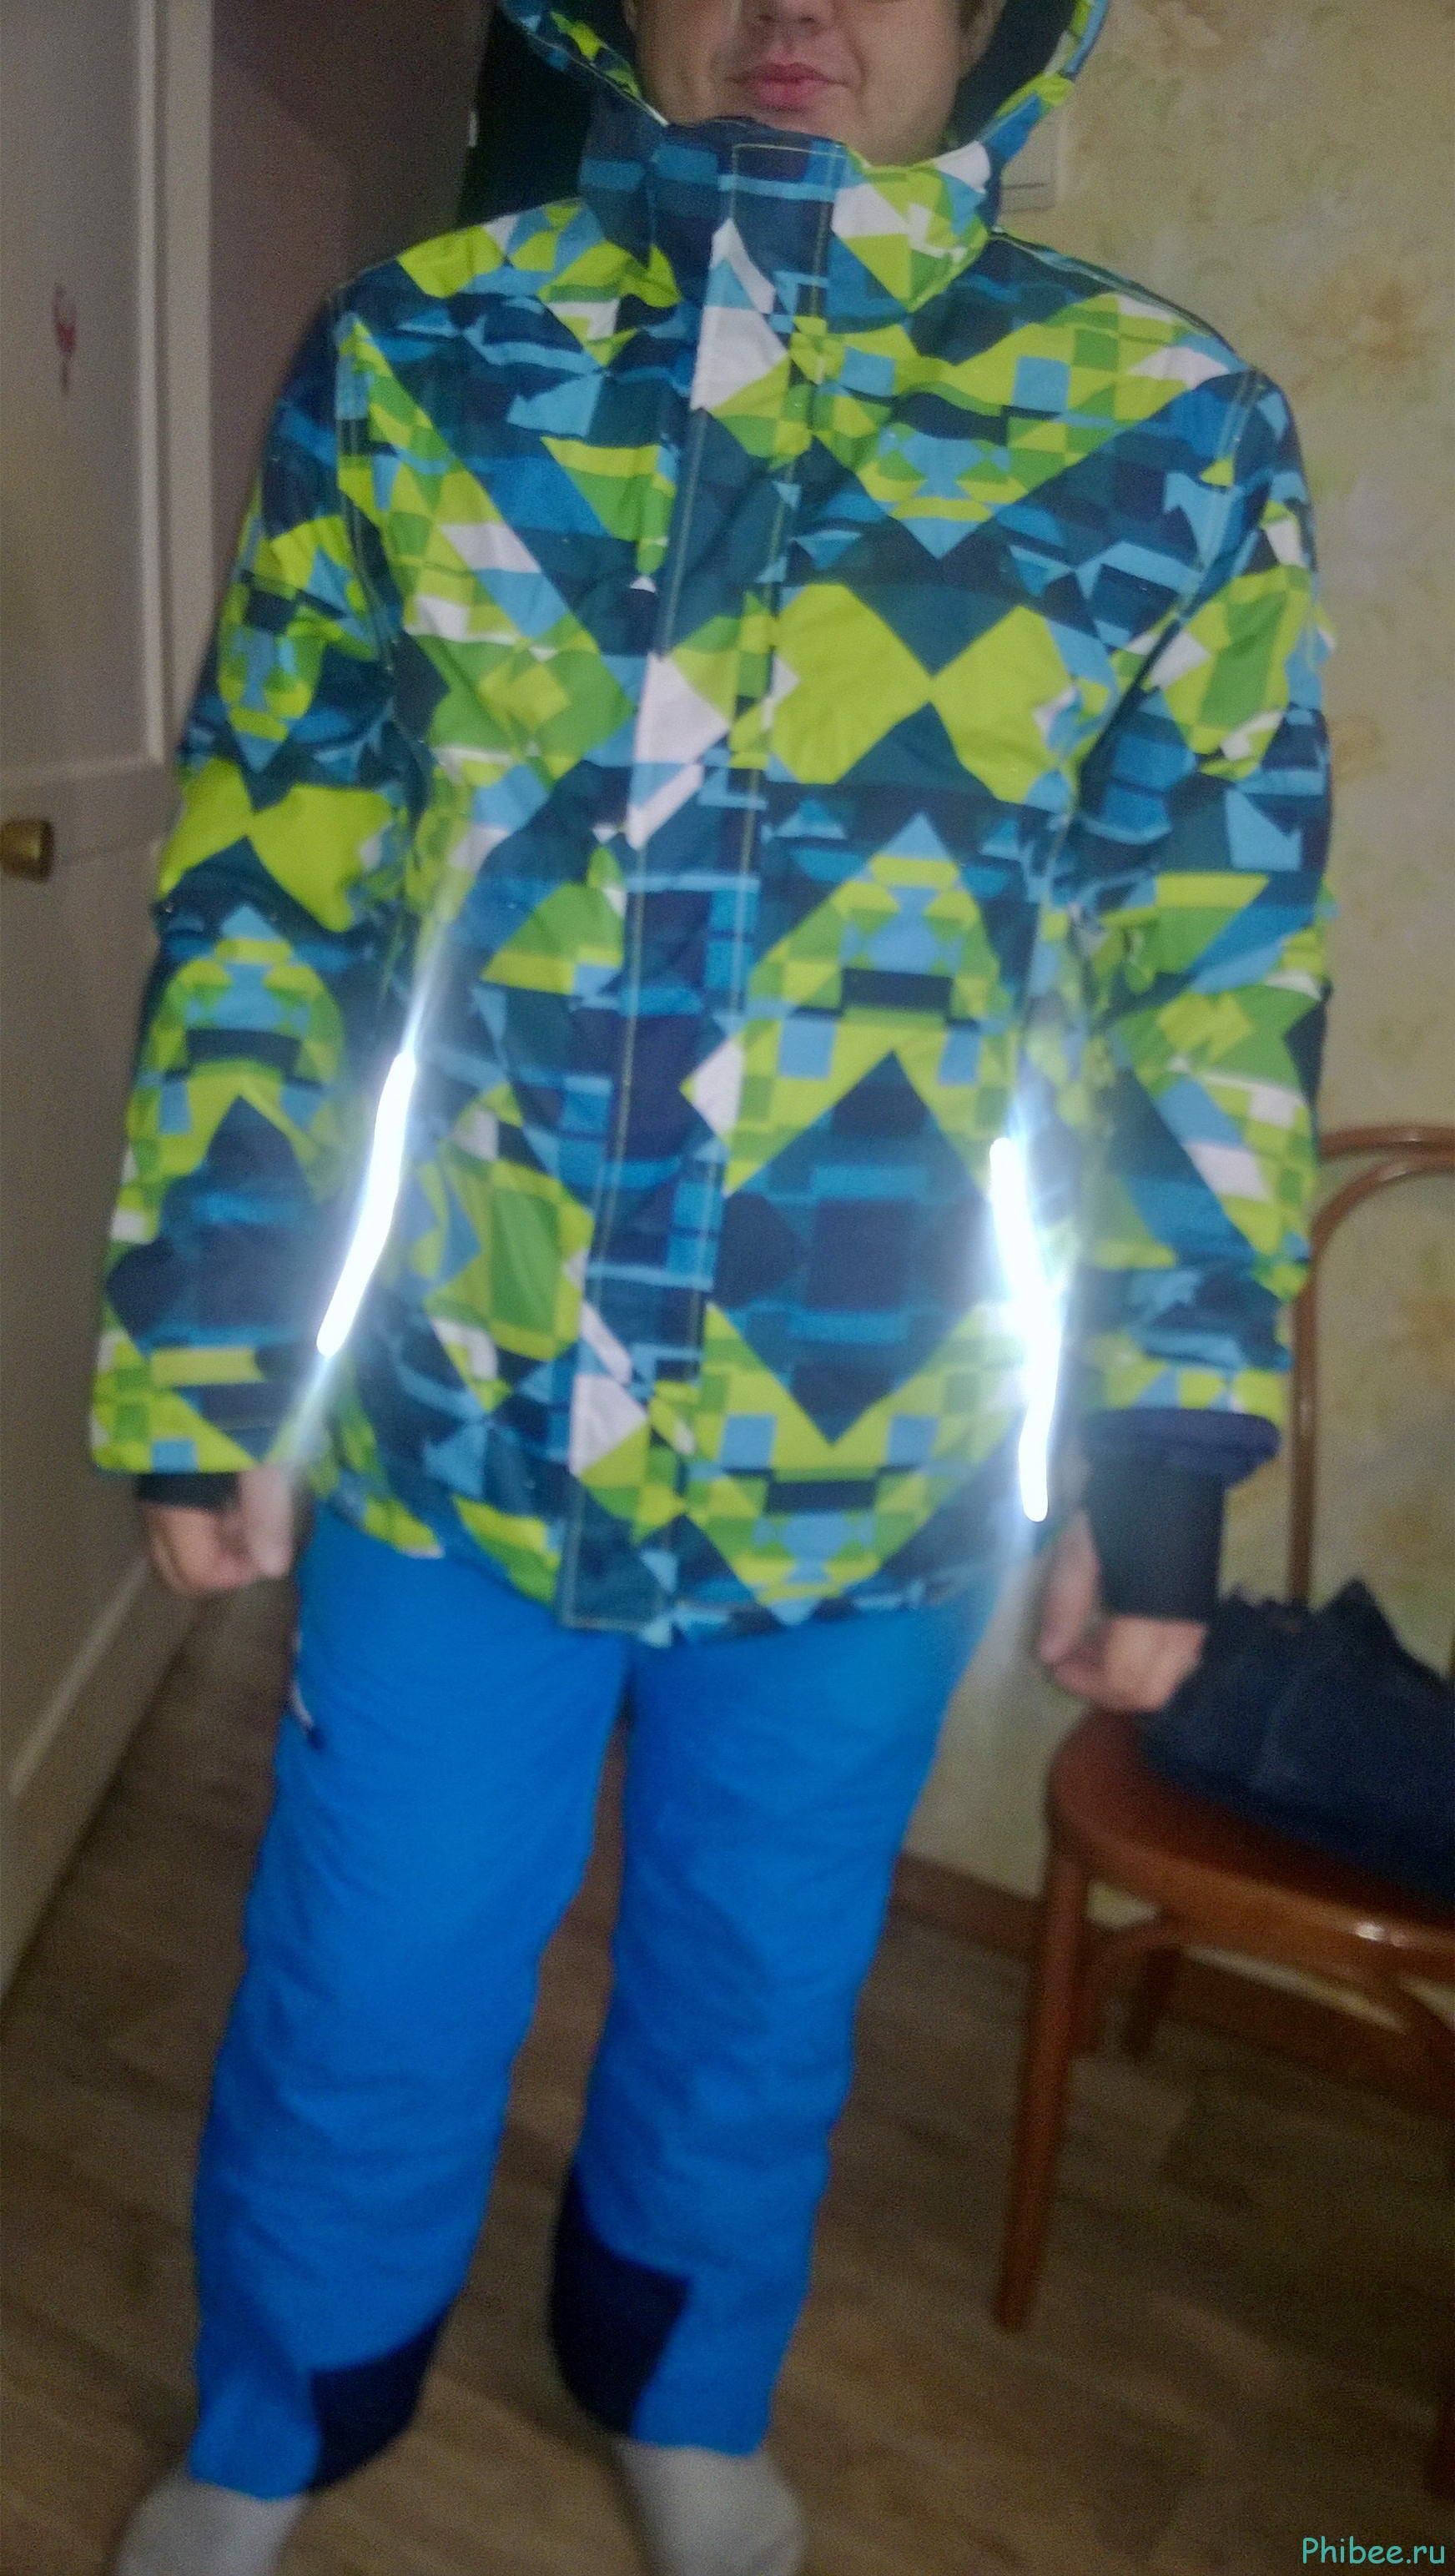 Отзыв на мужской горнолыжный костюм Phibee 8010